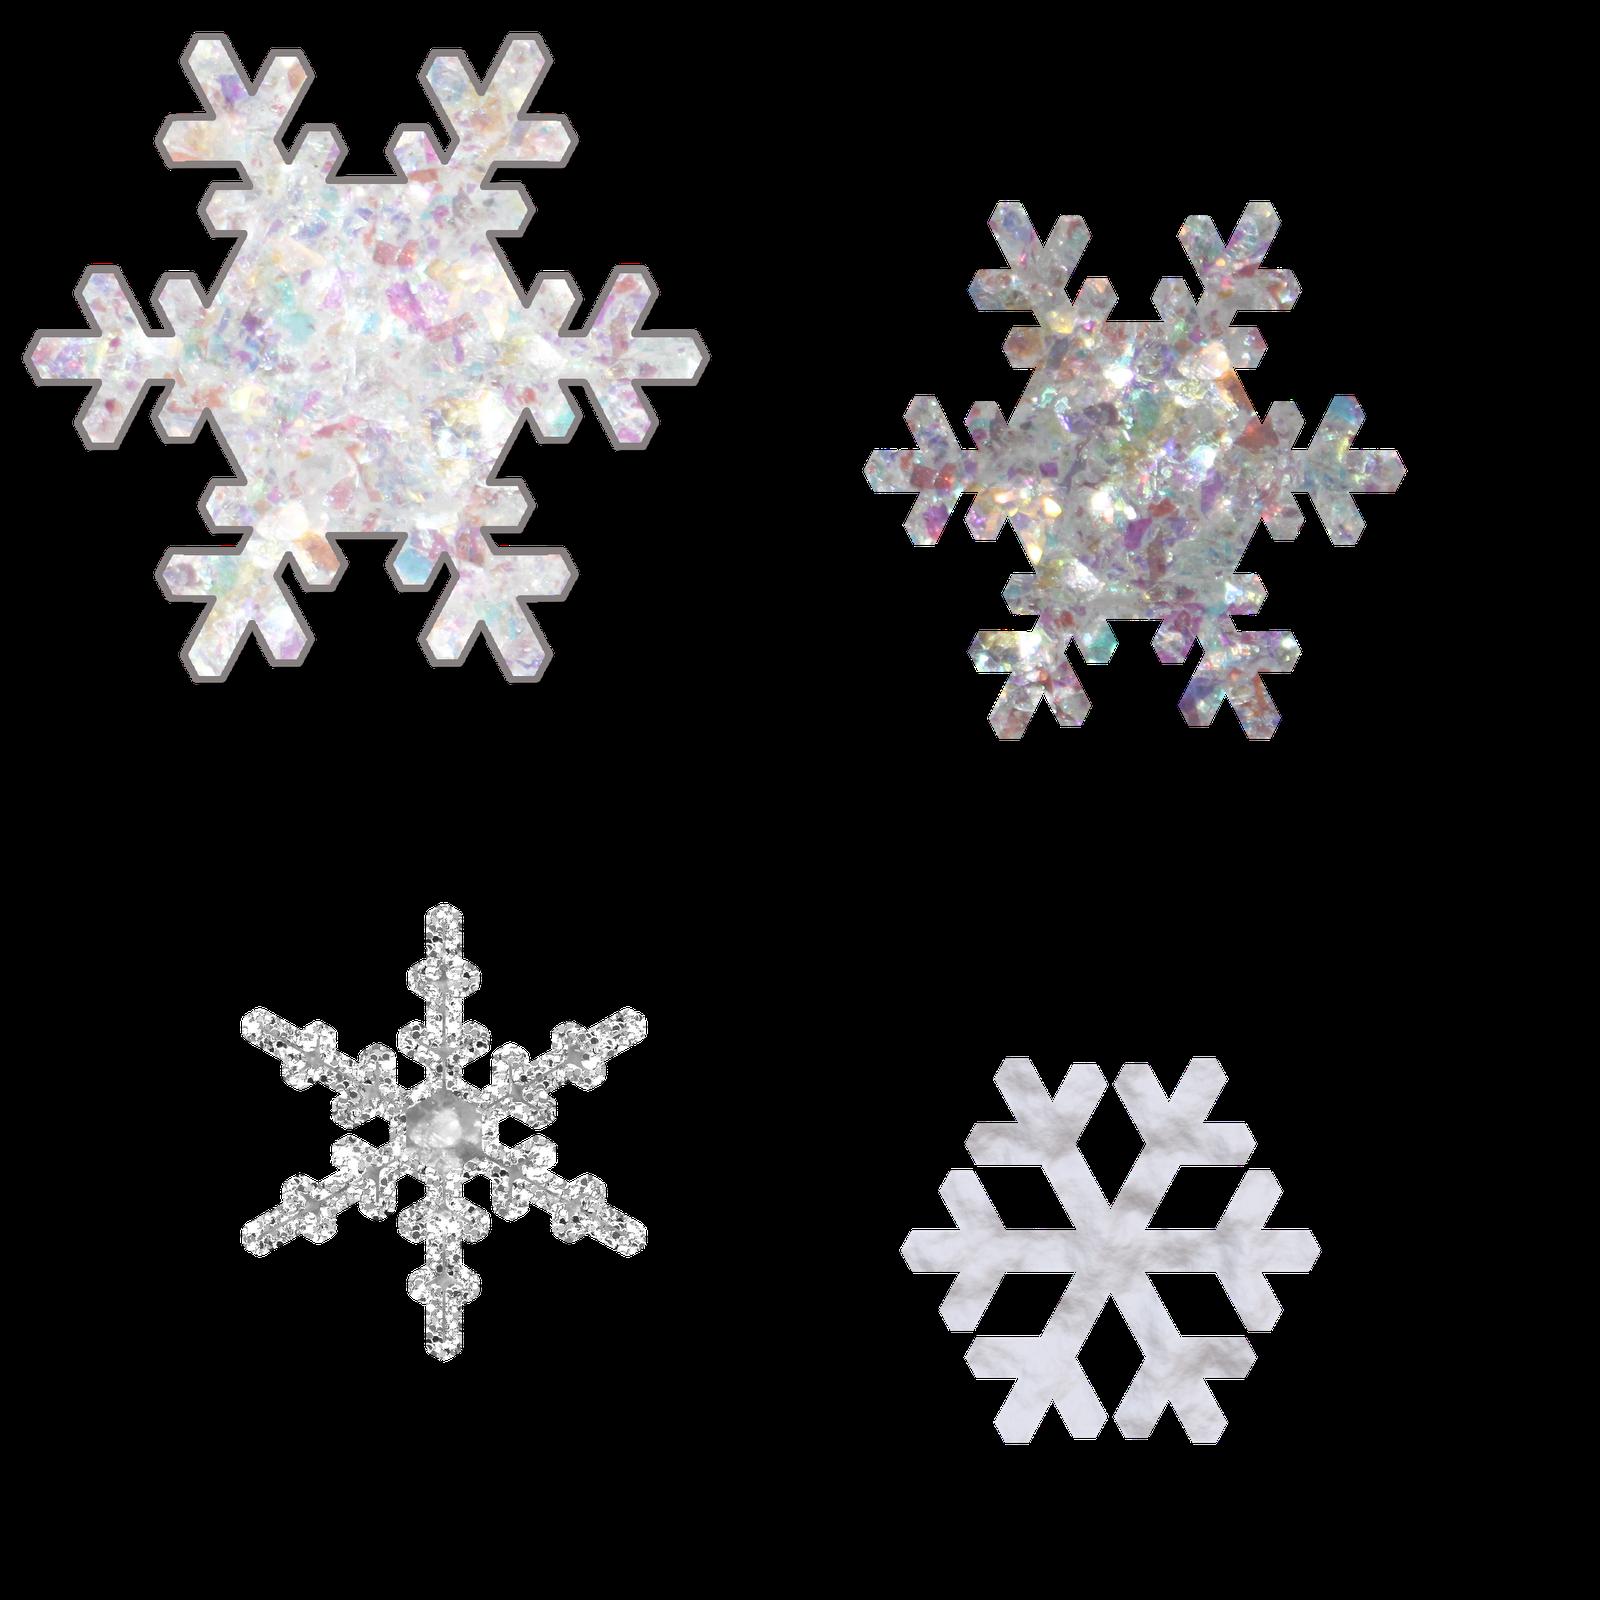 border snowflake png